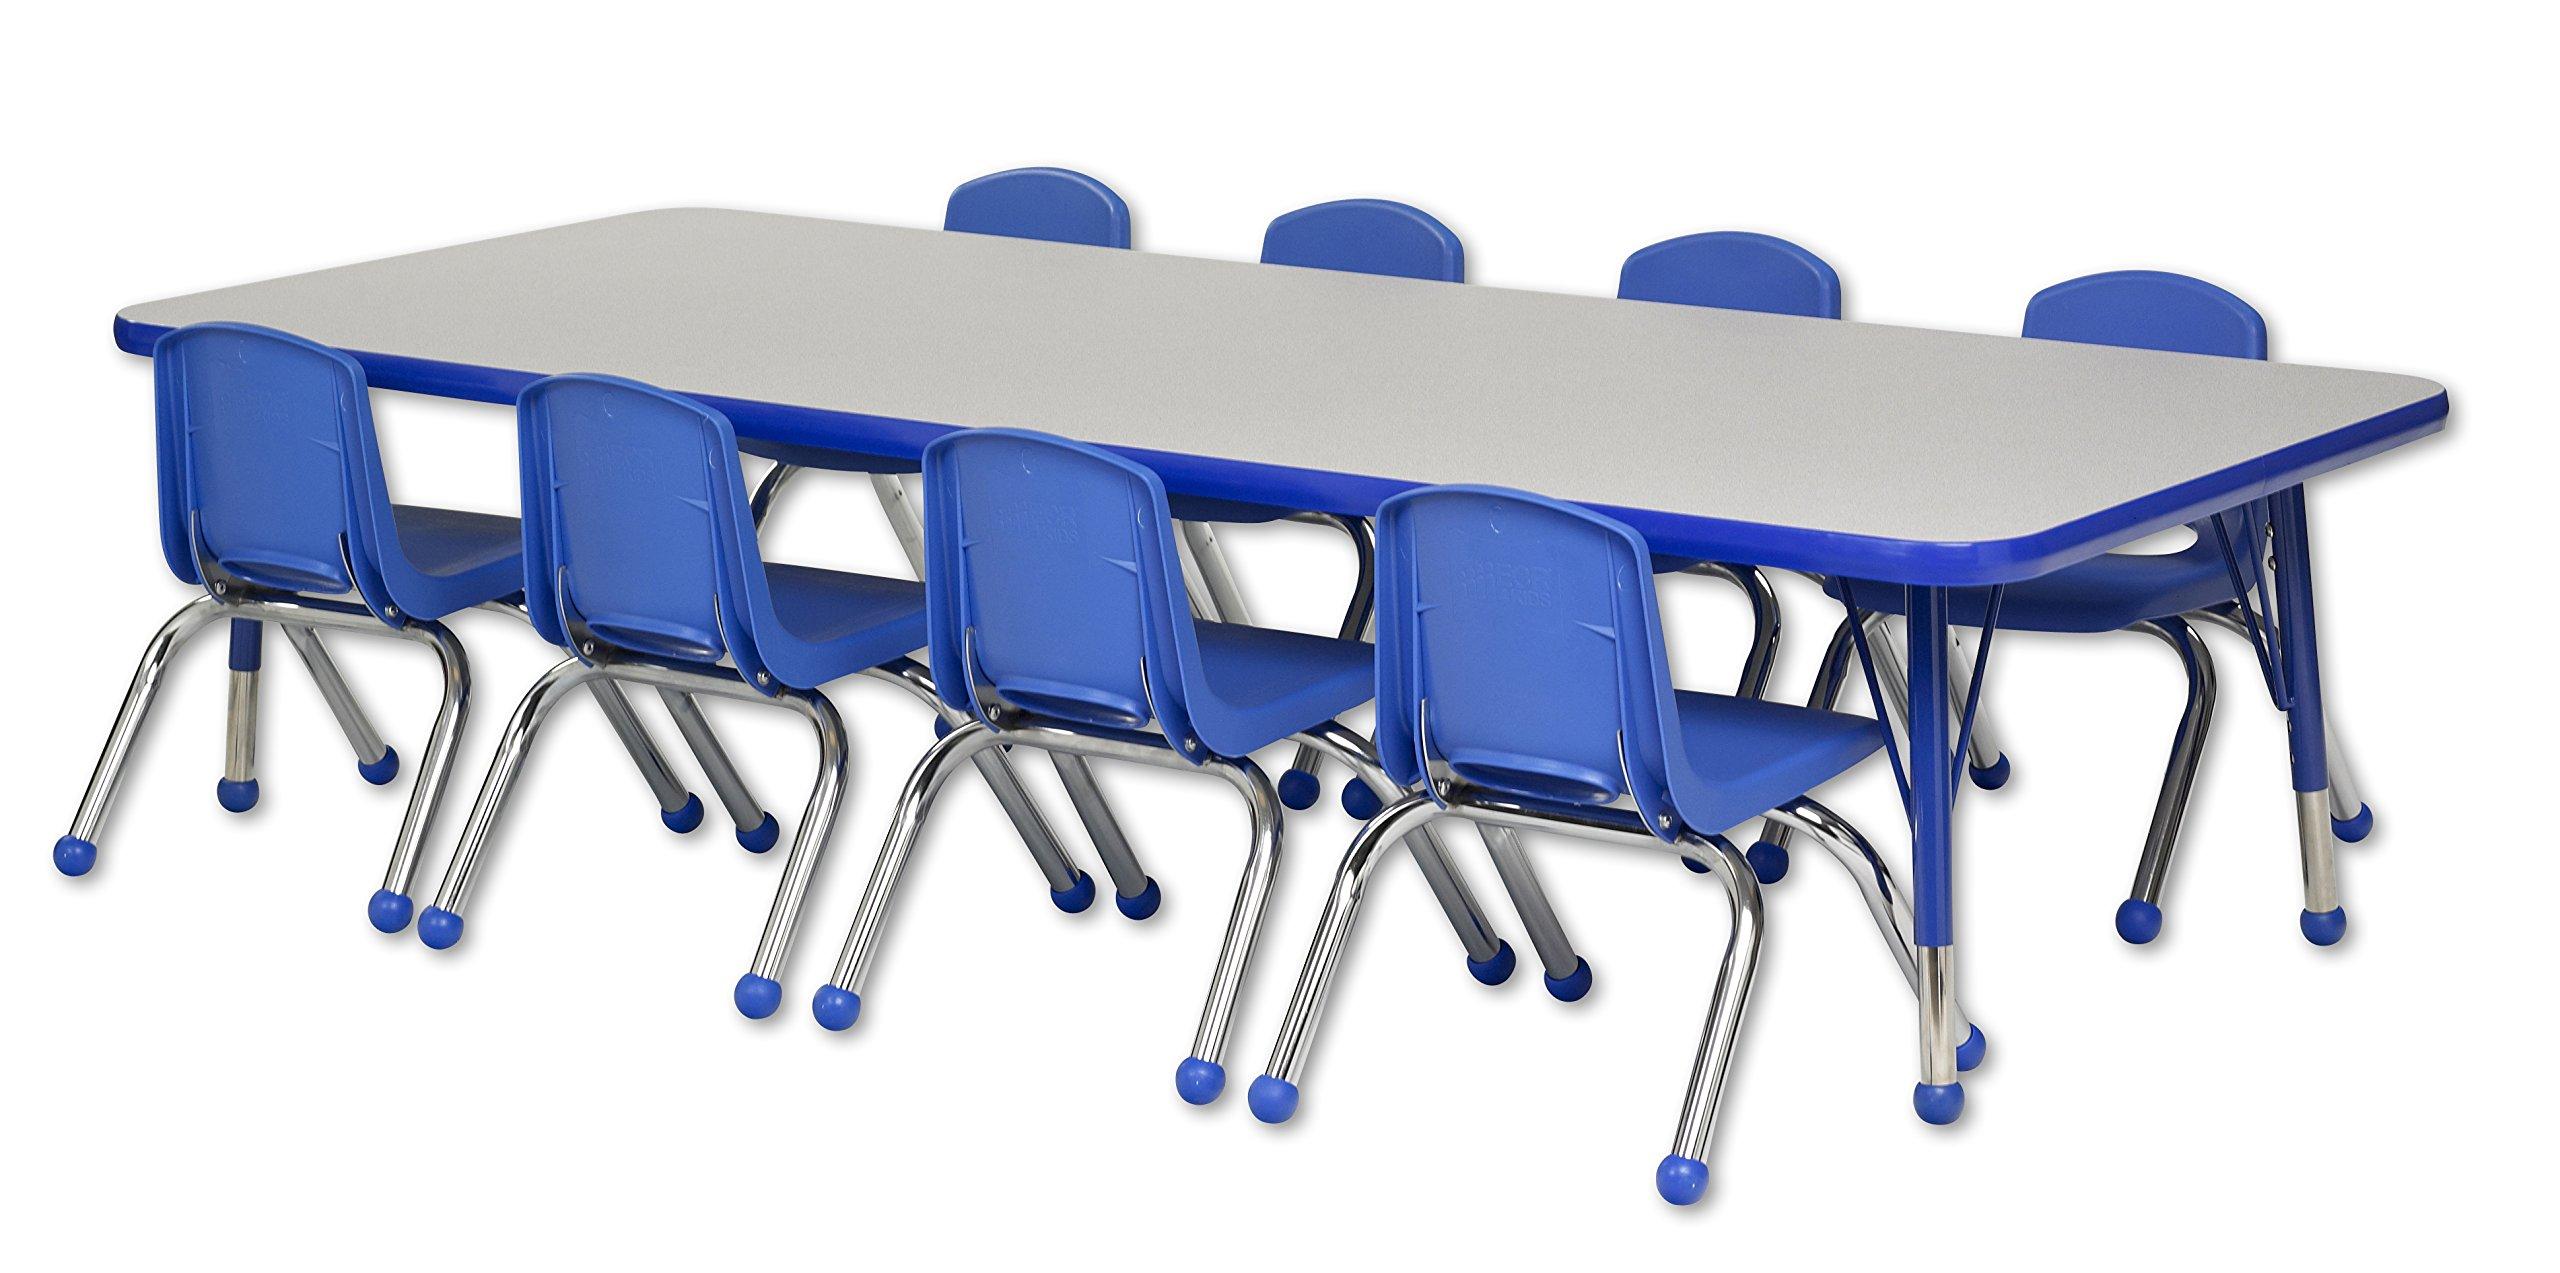 ECR4Kids 30'' x 72'' Rectangular Activity Table, Gray Top/Blue Edge, Toddler Legs/Ball Glides, Eight 12'' Blue School Stack Chairs